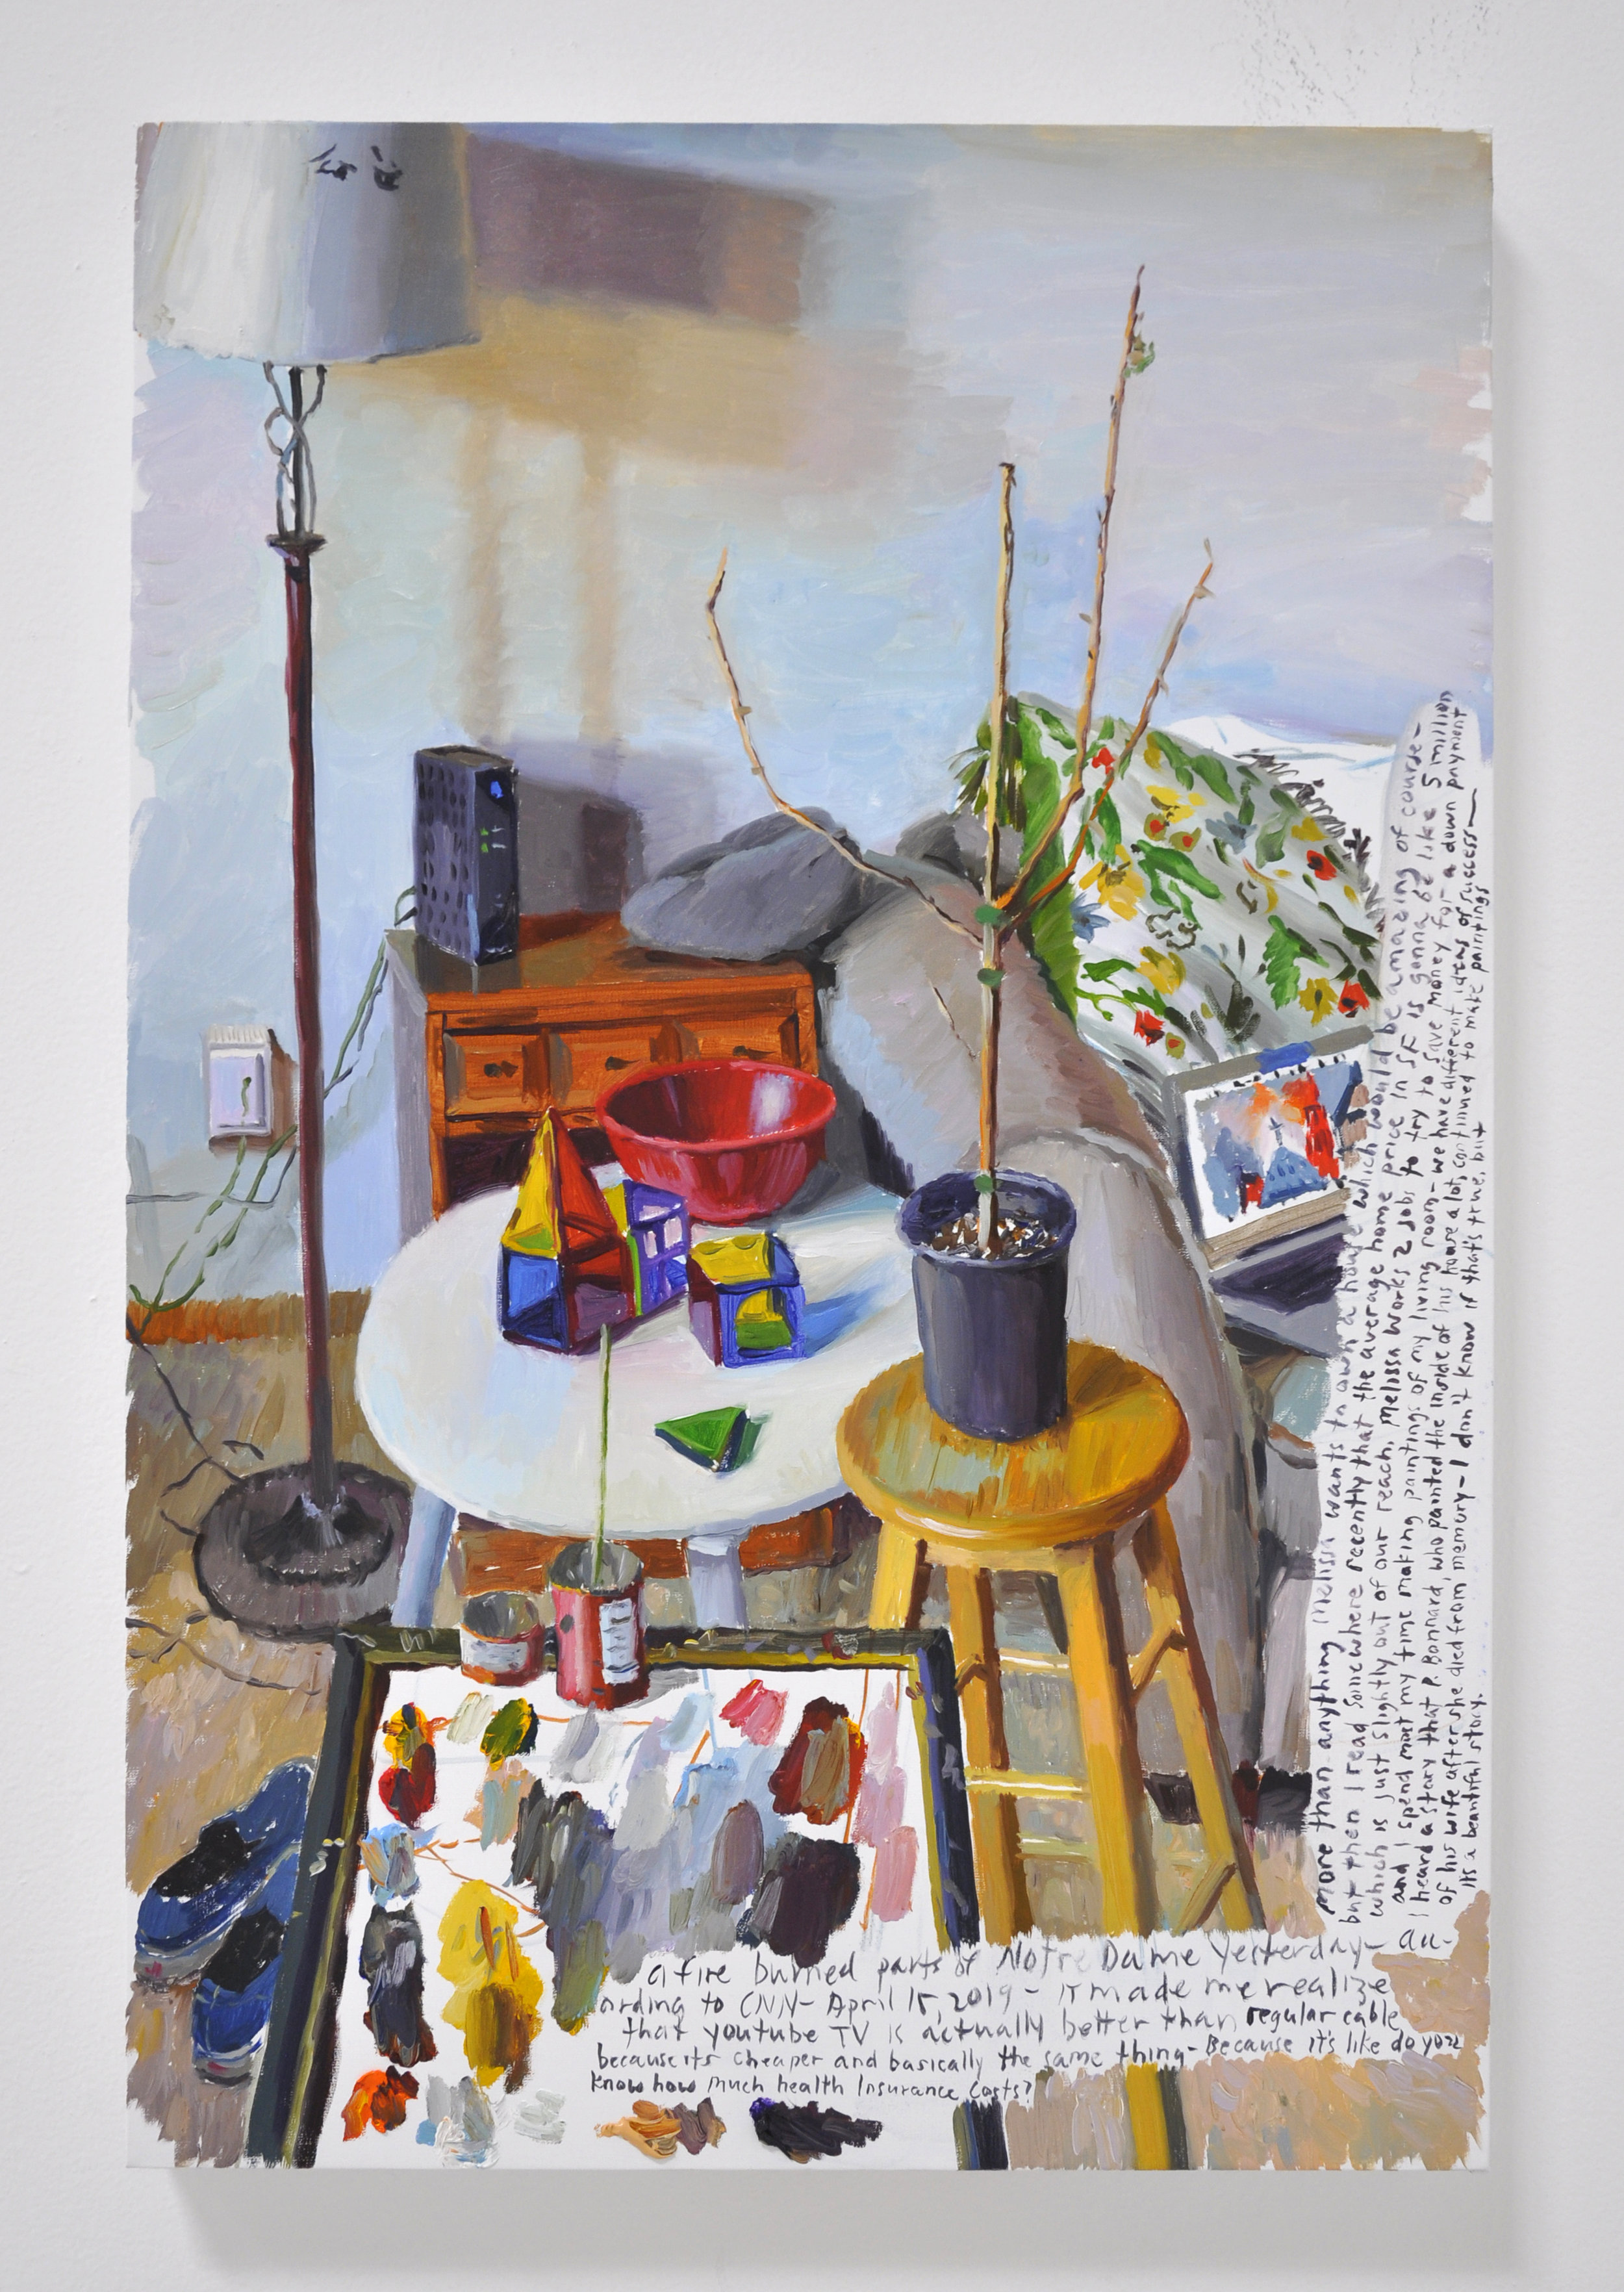 Terry Powers Adam Beris Guerrero Gallery